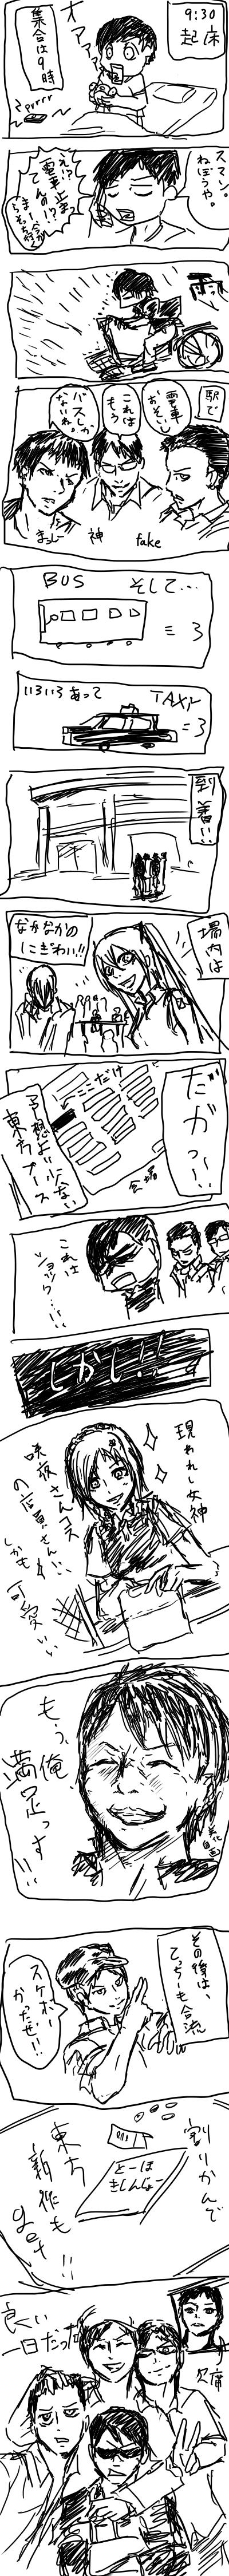 komike